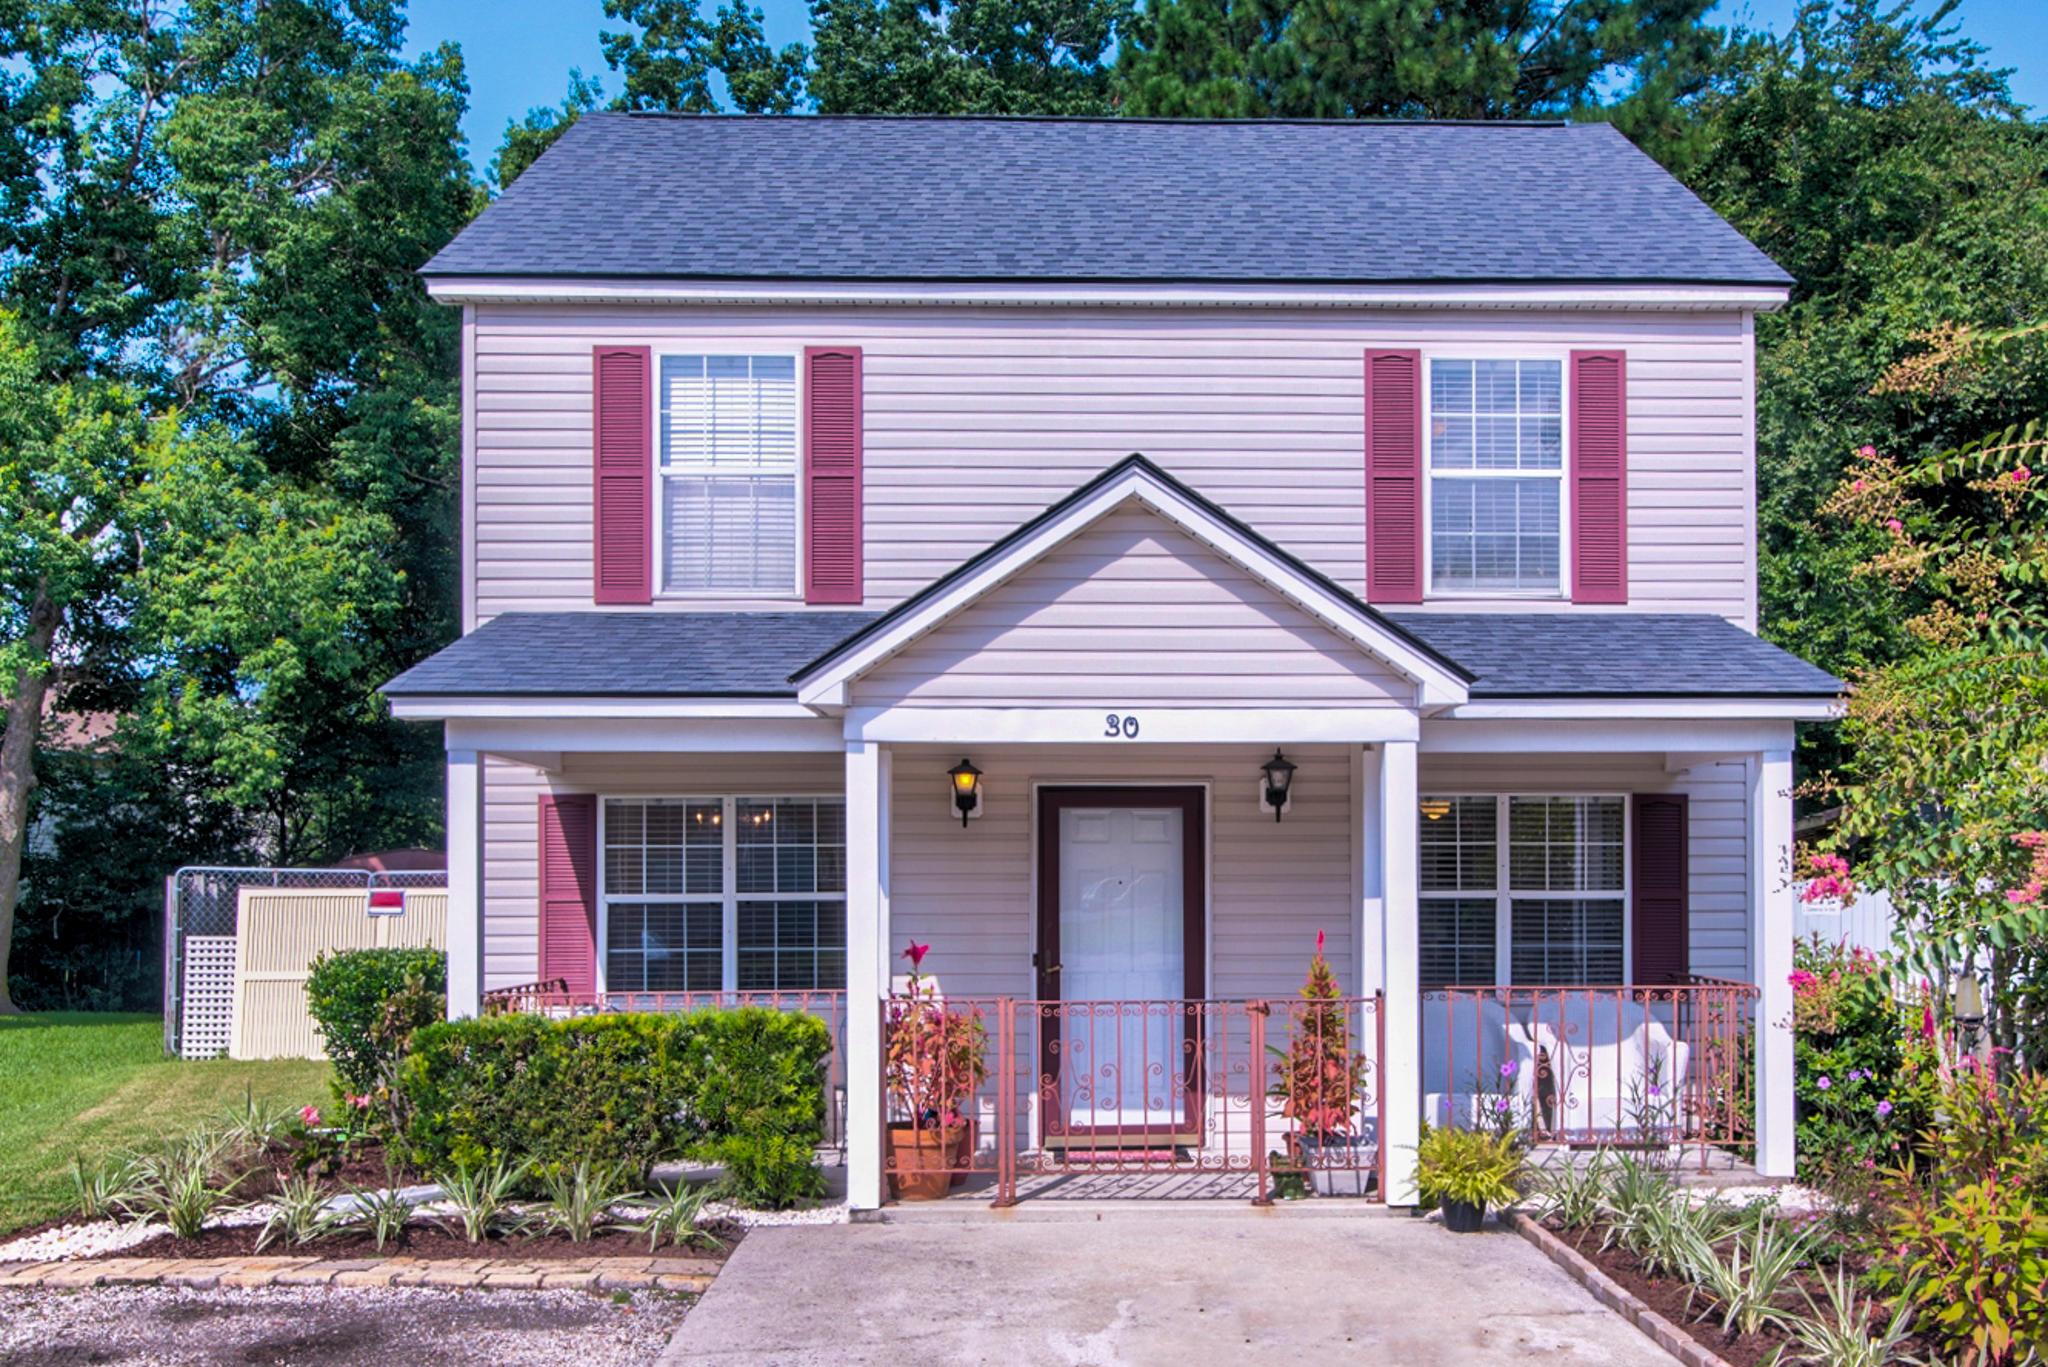 Woodlands Homes For Sale - 30 Palmetto Park, Charleston, SC - 0